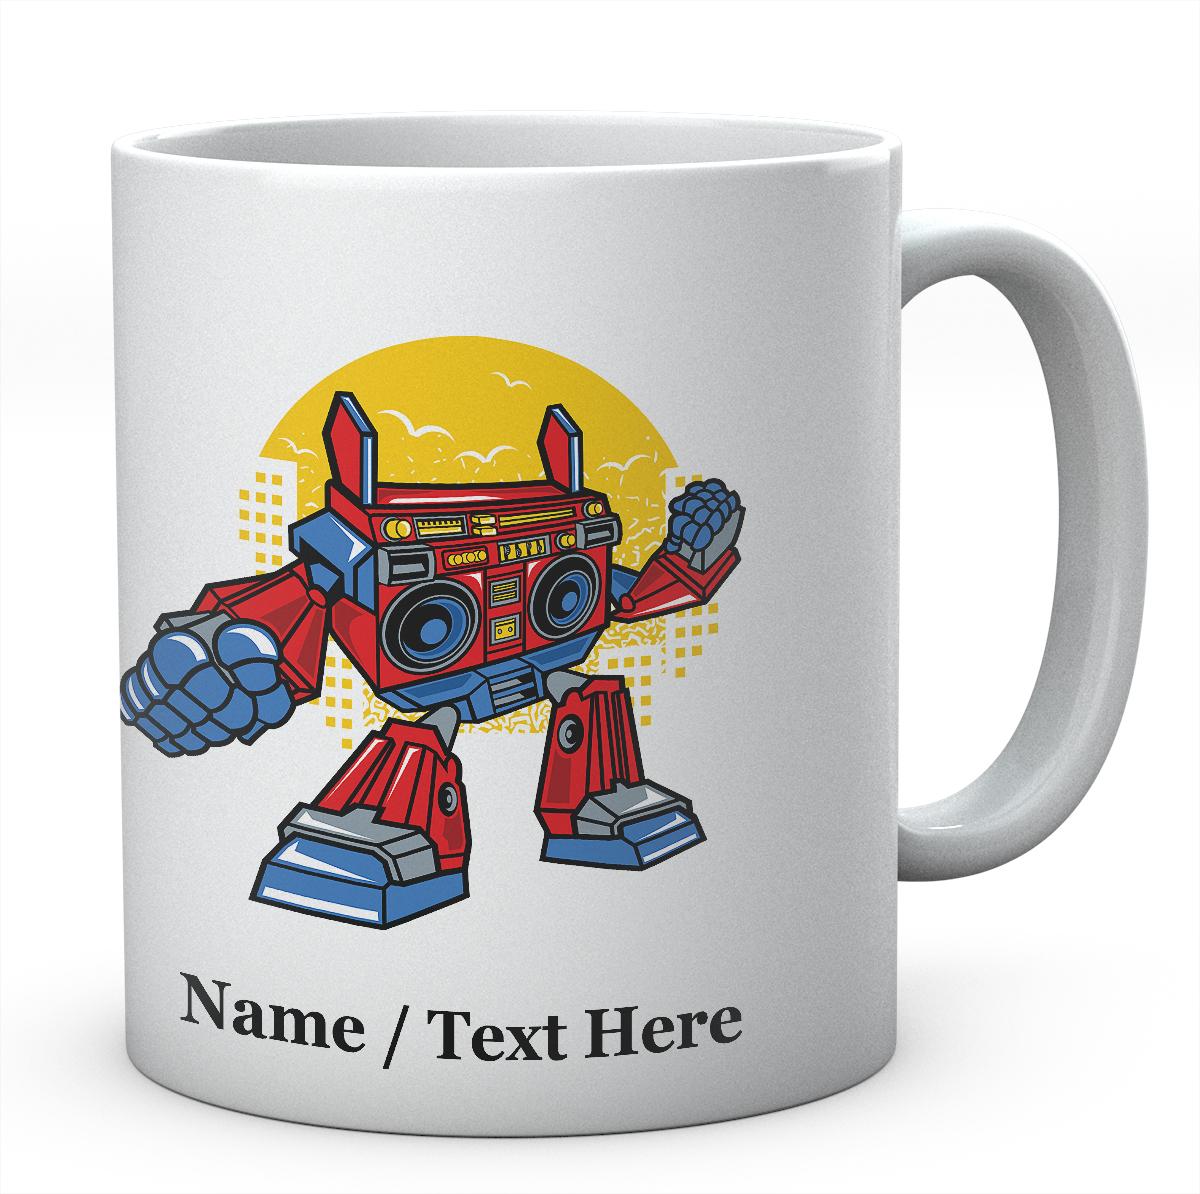 Boombox Robot Funny Personalised Ceramic Mug